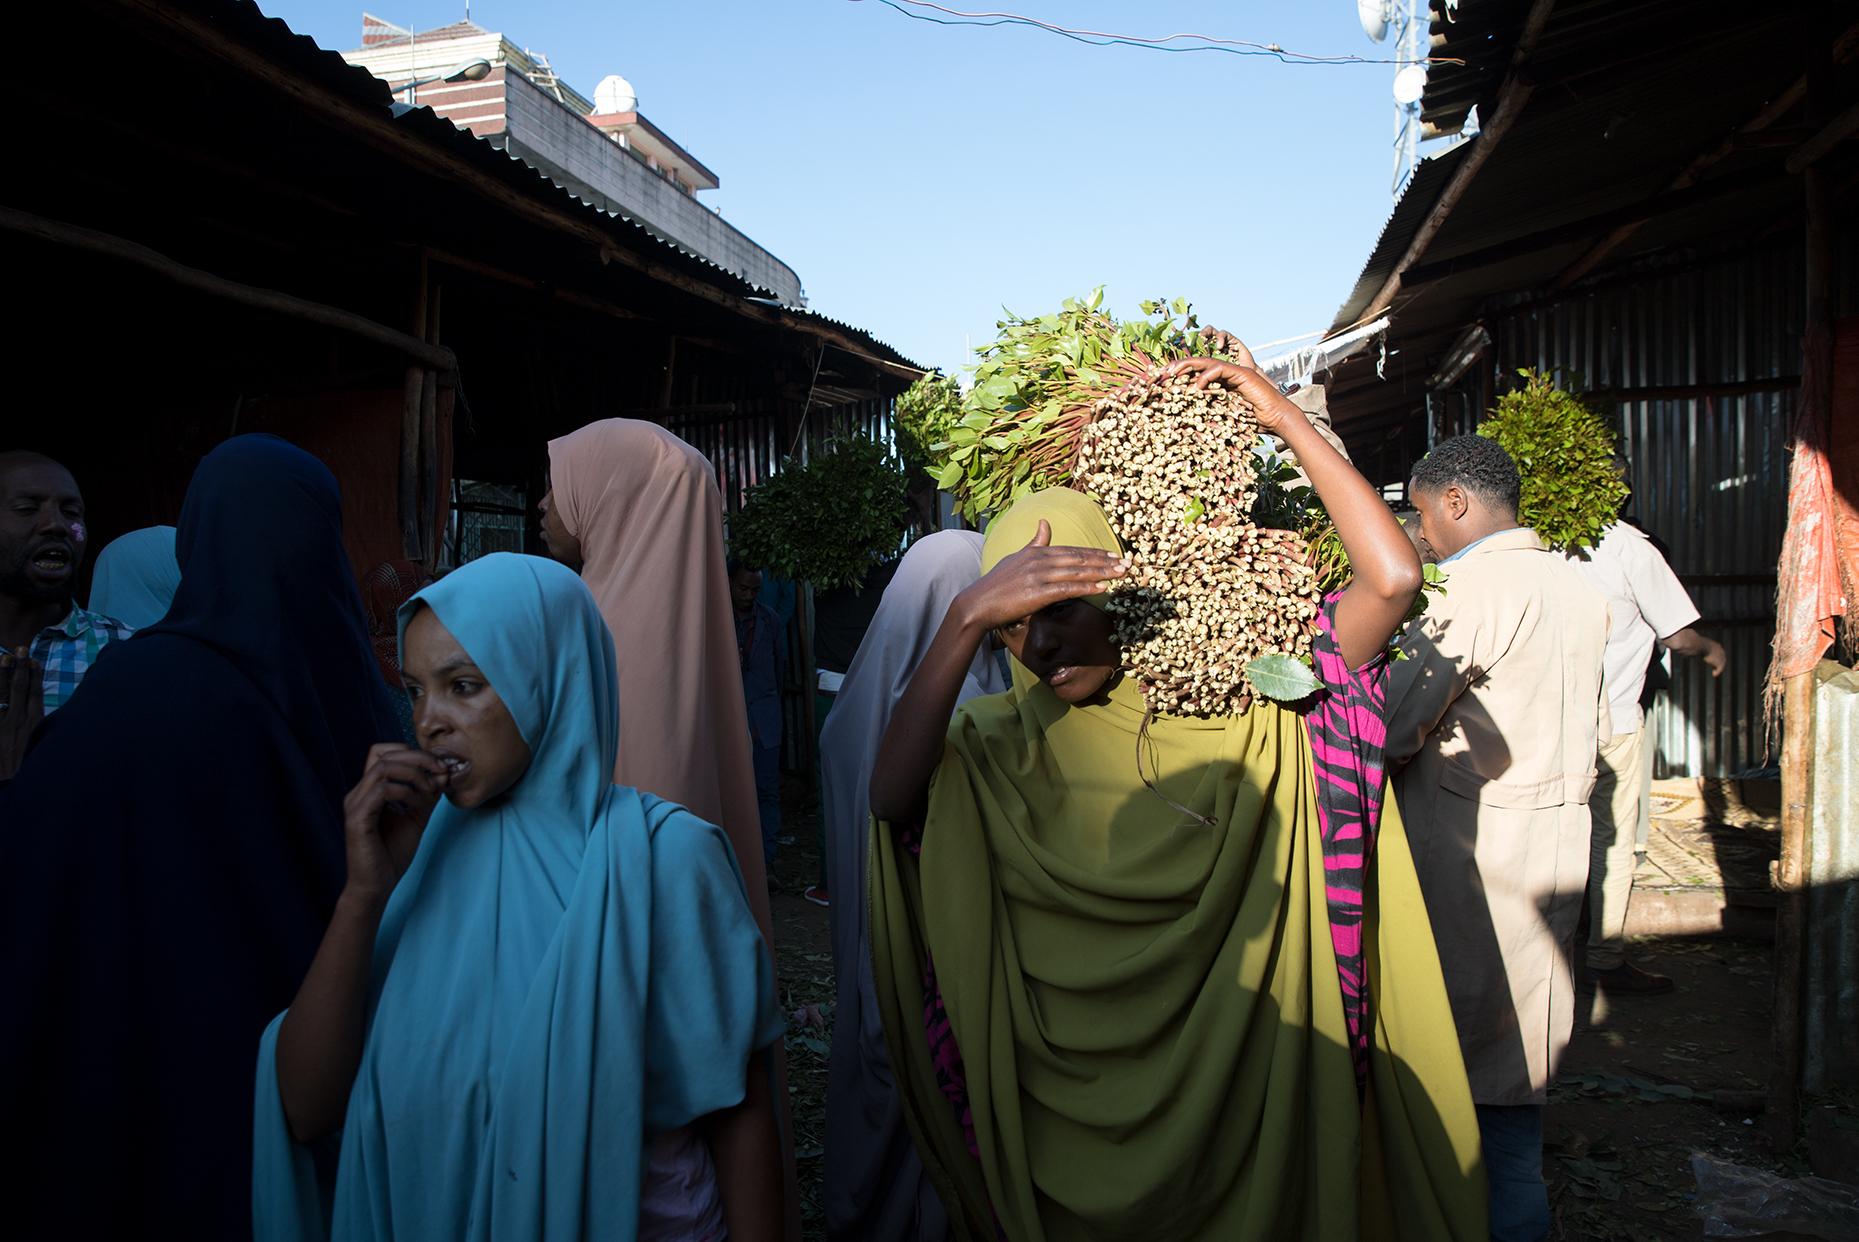 khat ethiopia harar market bunch